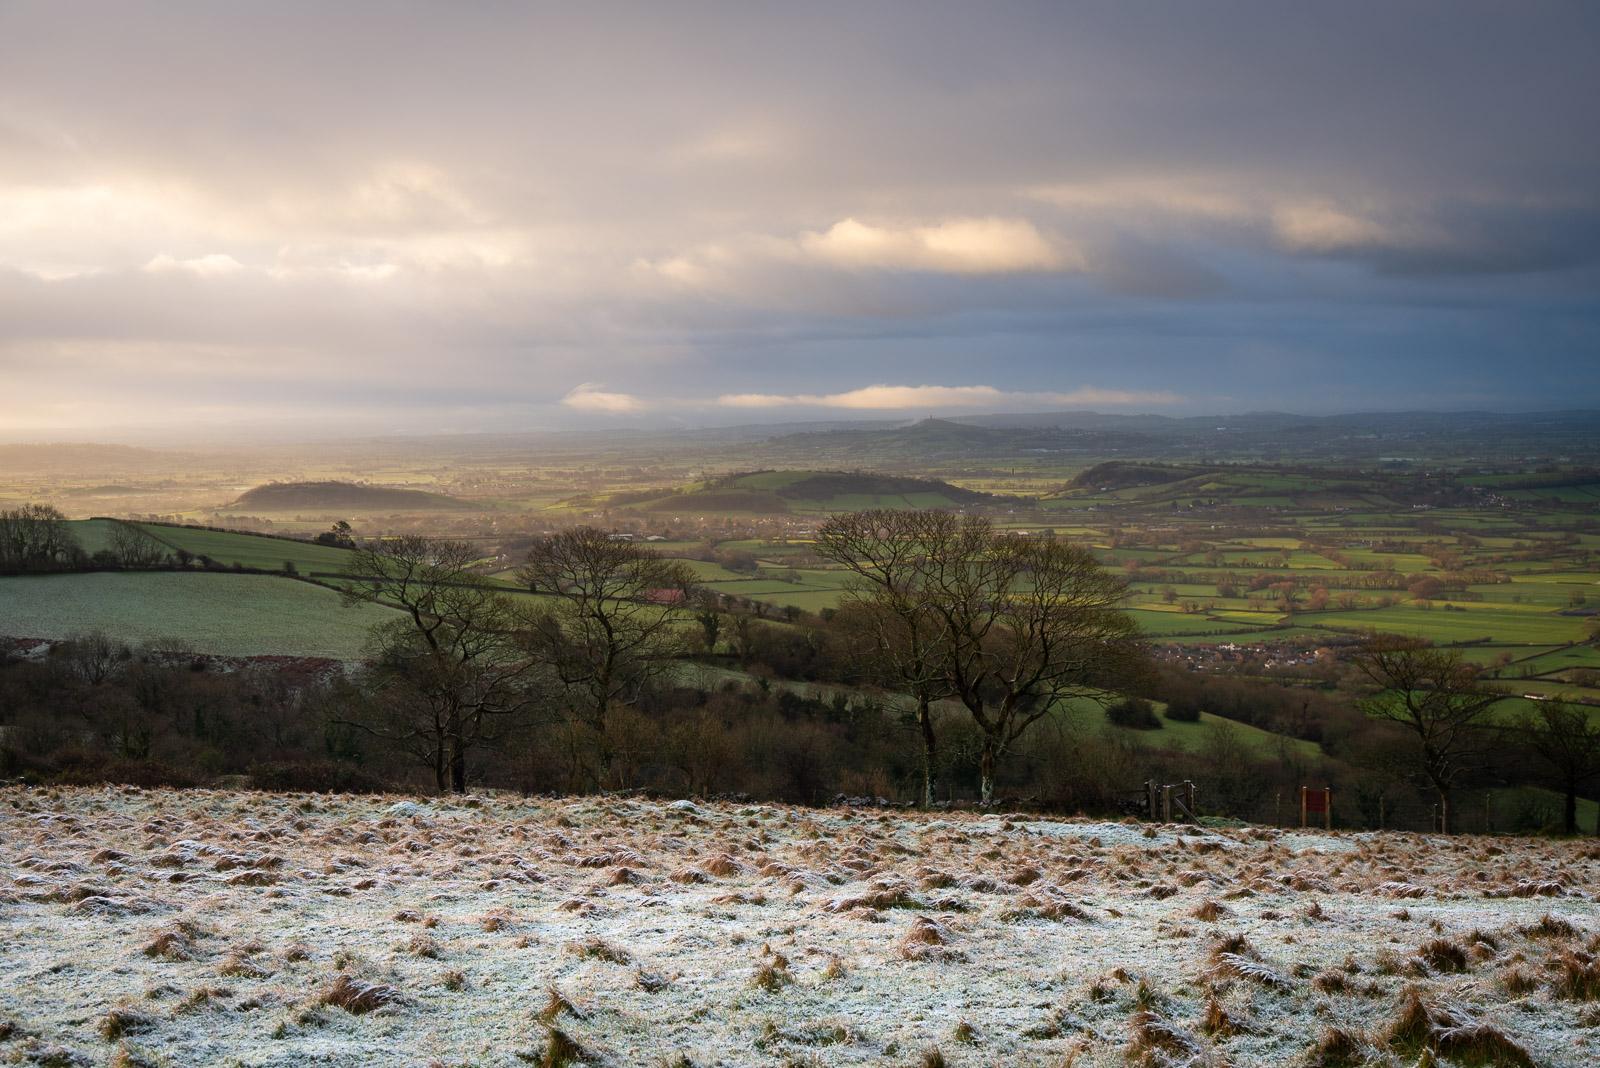 Winter Sunrise at Lynchcombe - From Cooks Fields, Mendip Hills, Somerset, UK. ID JB1_1227H